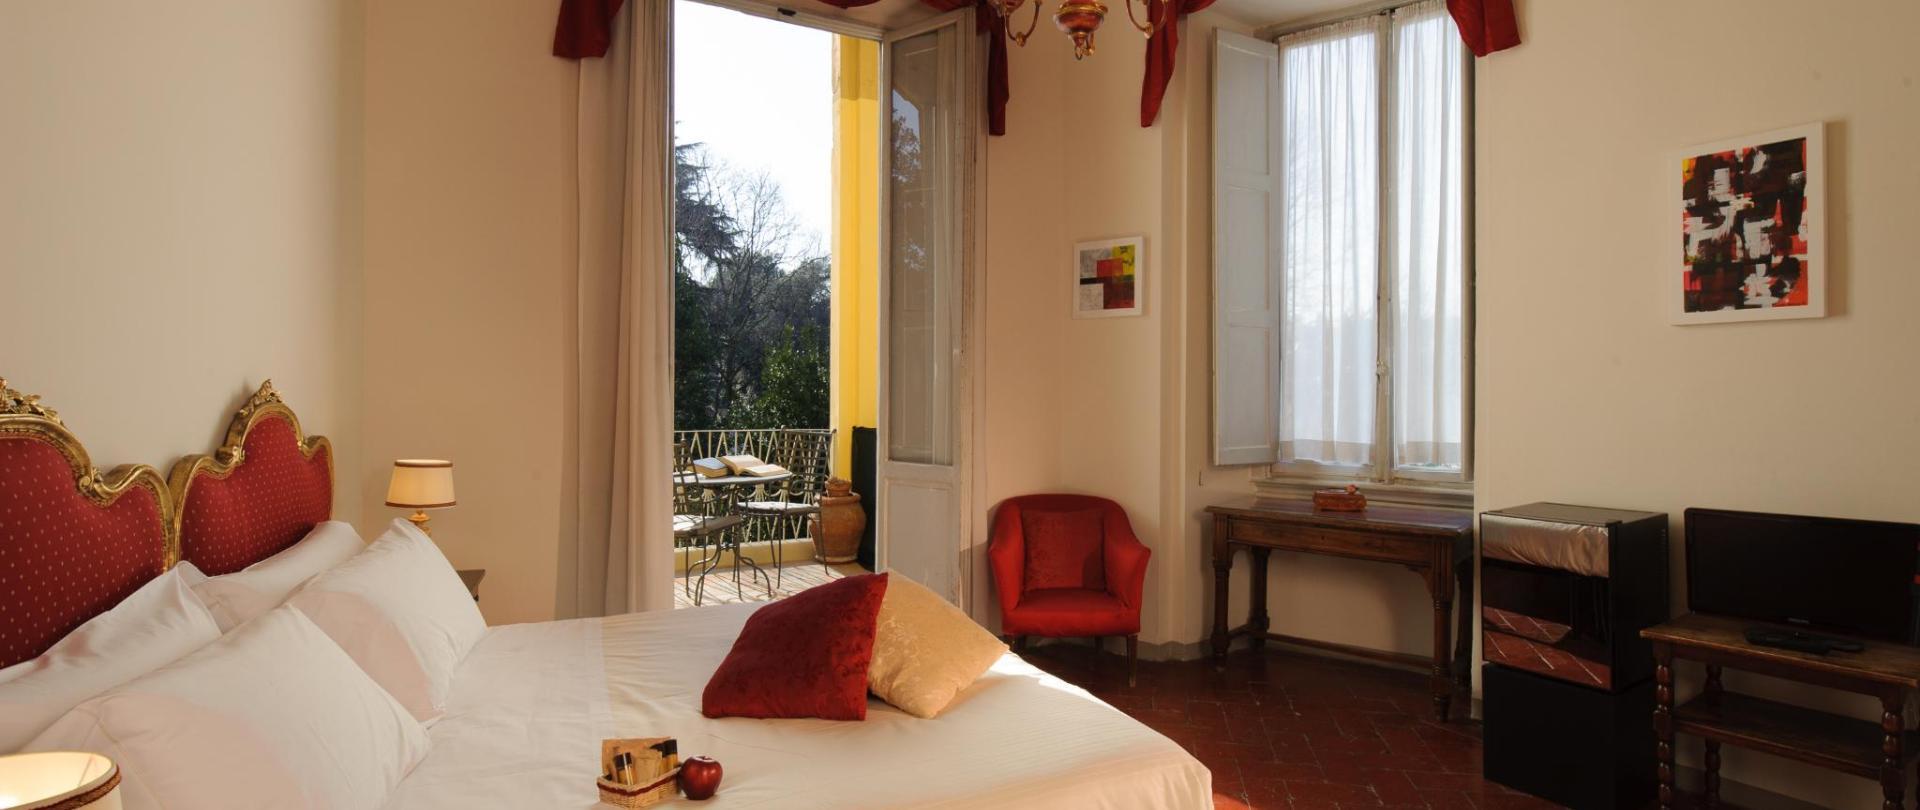 hotelannalena-17.jpg